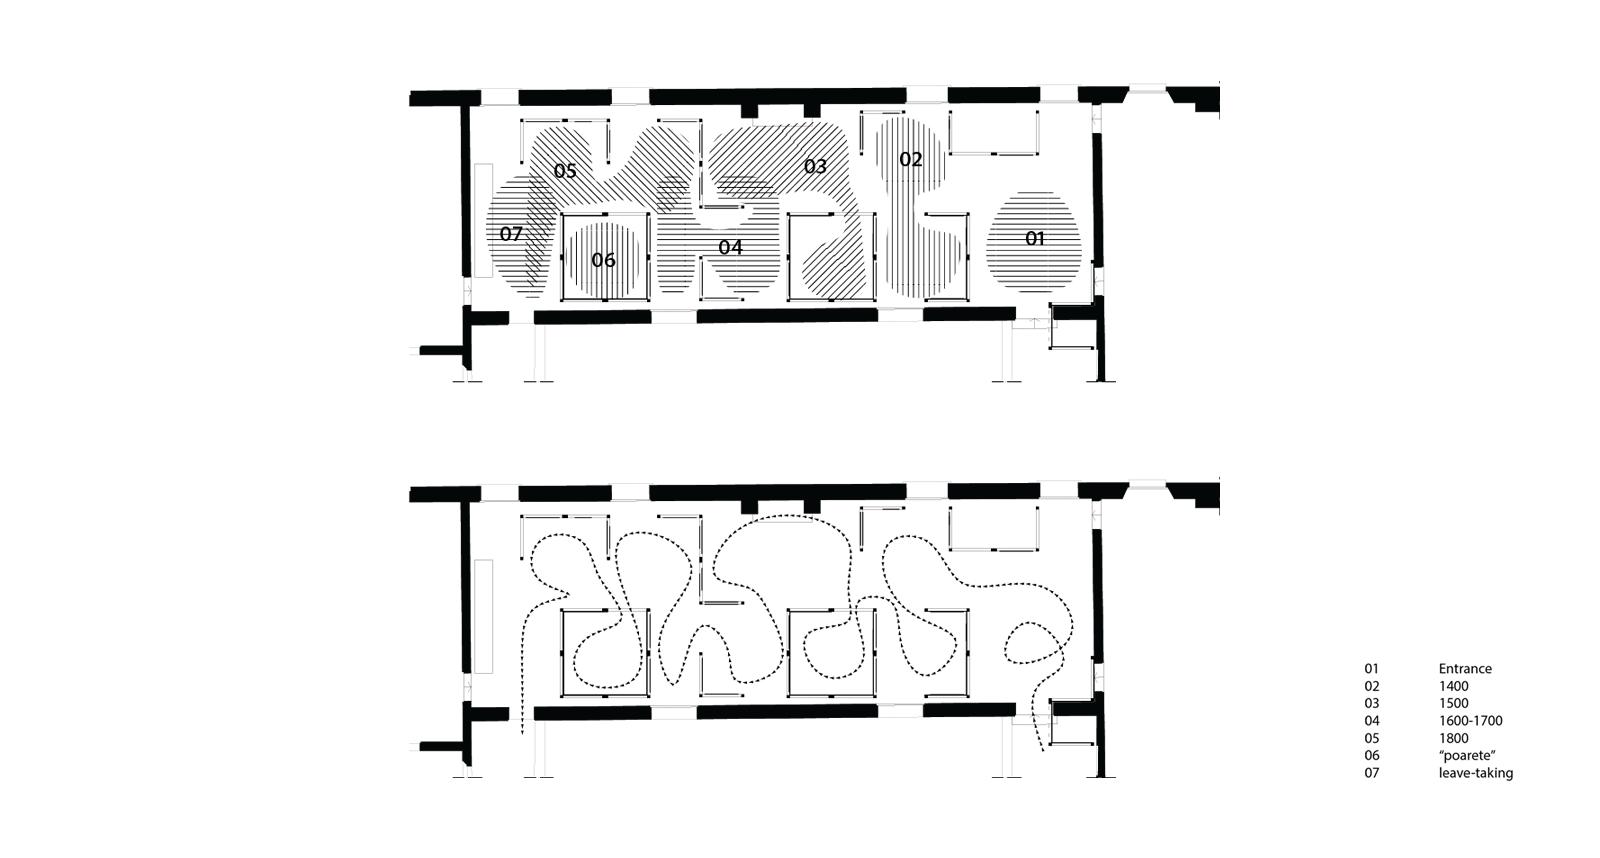 allestimento-fotografico-ferrara-diagram